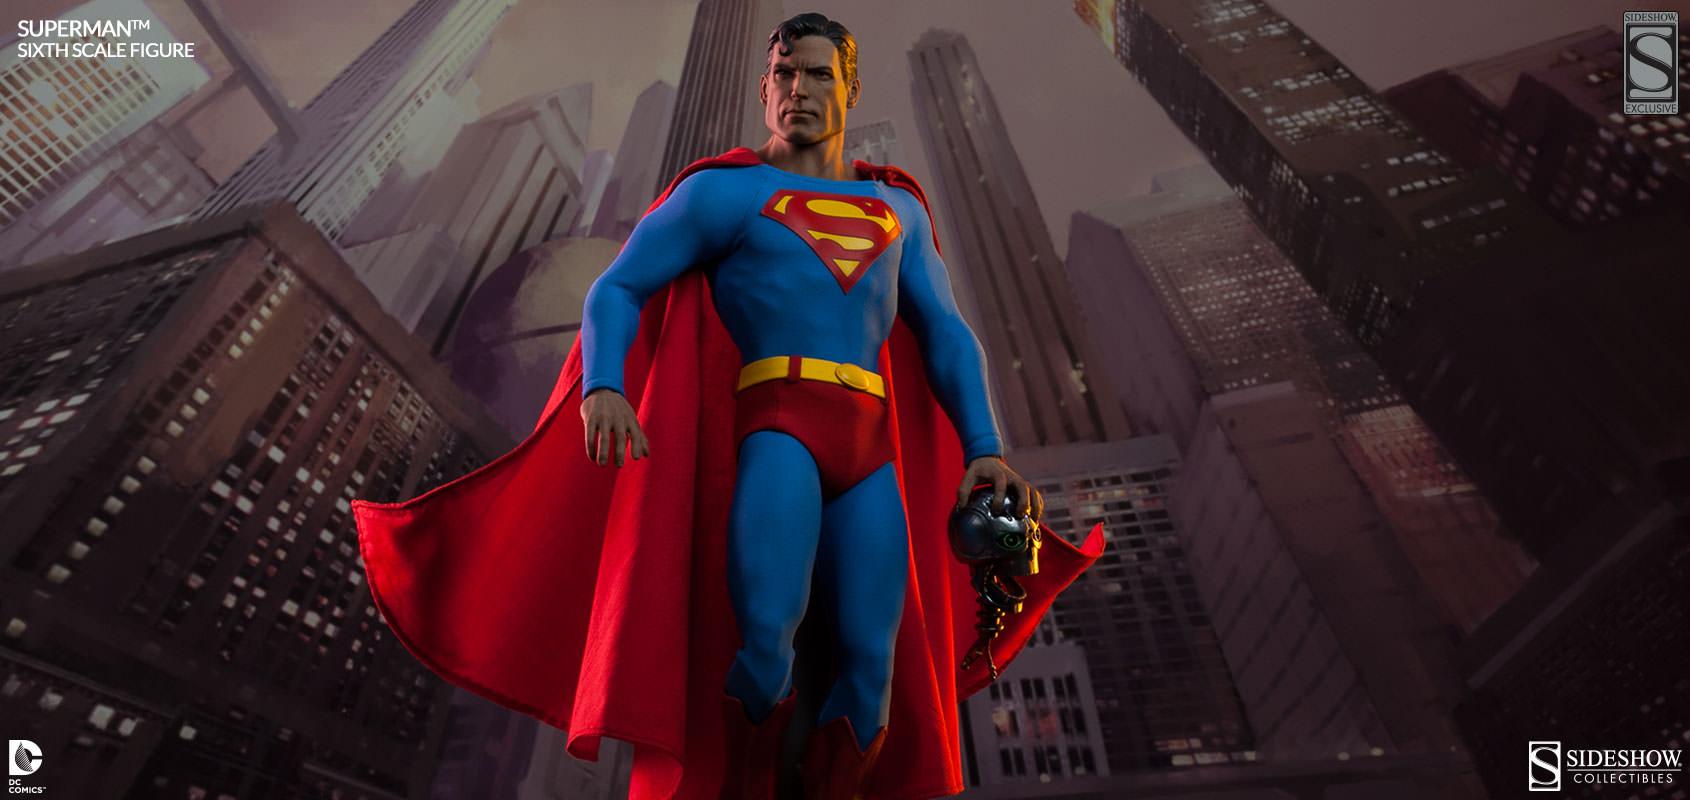 DC - SUPERMAN - Page 2 Attachment